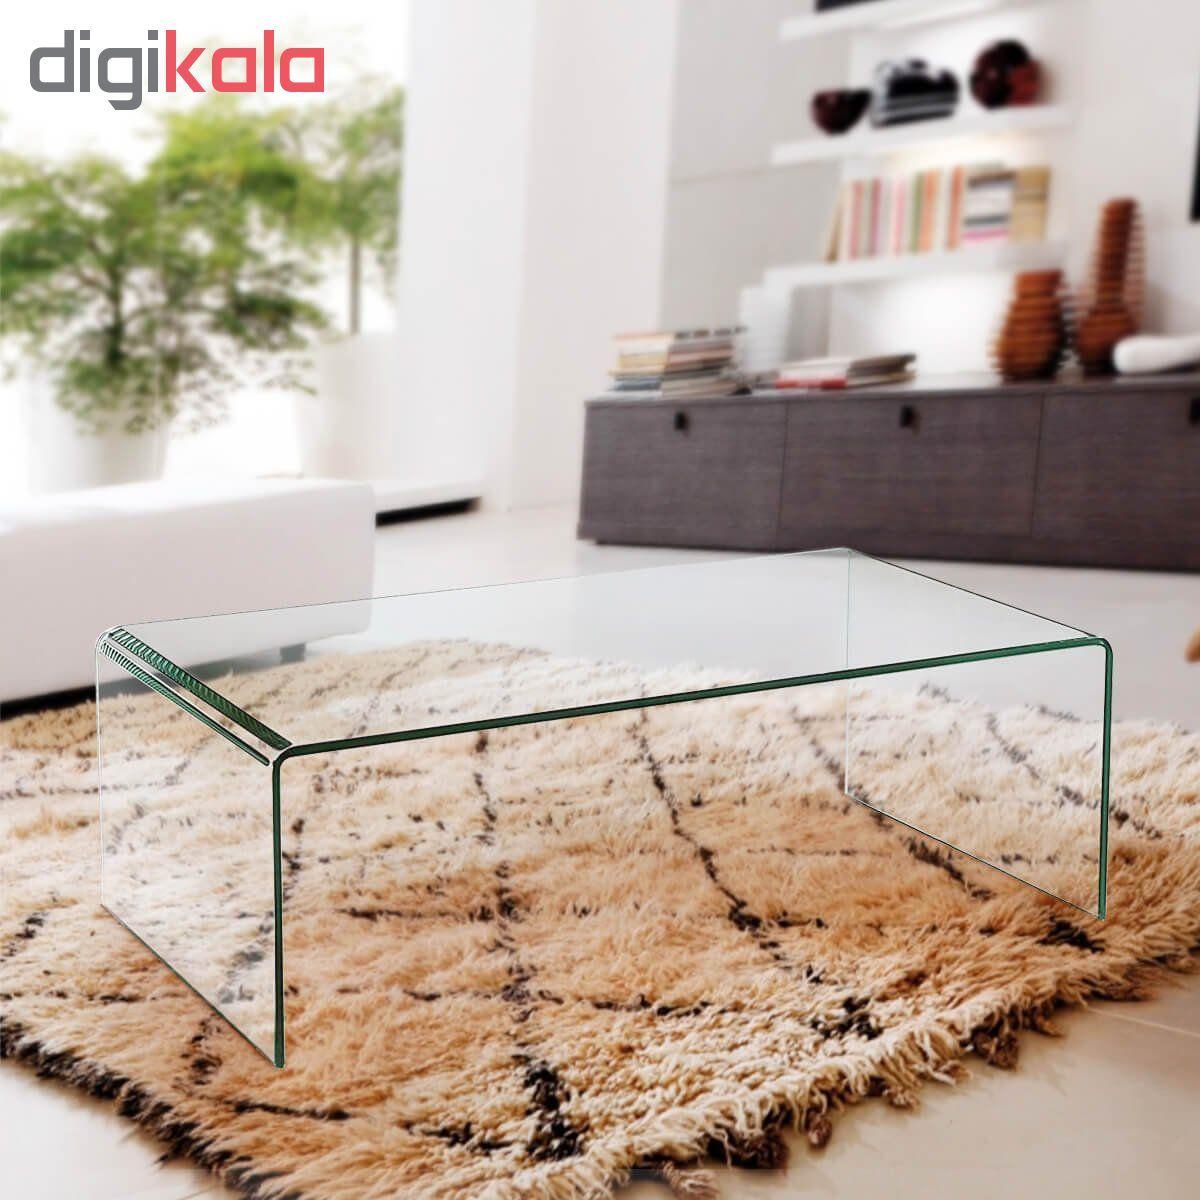 میز جلو مبلی شیشه خم اطلس 12 میل طول 110 سانتی متر main 1 4